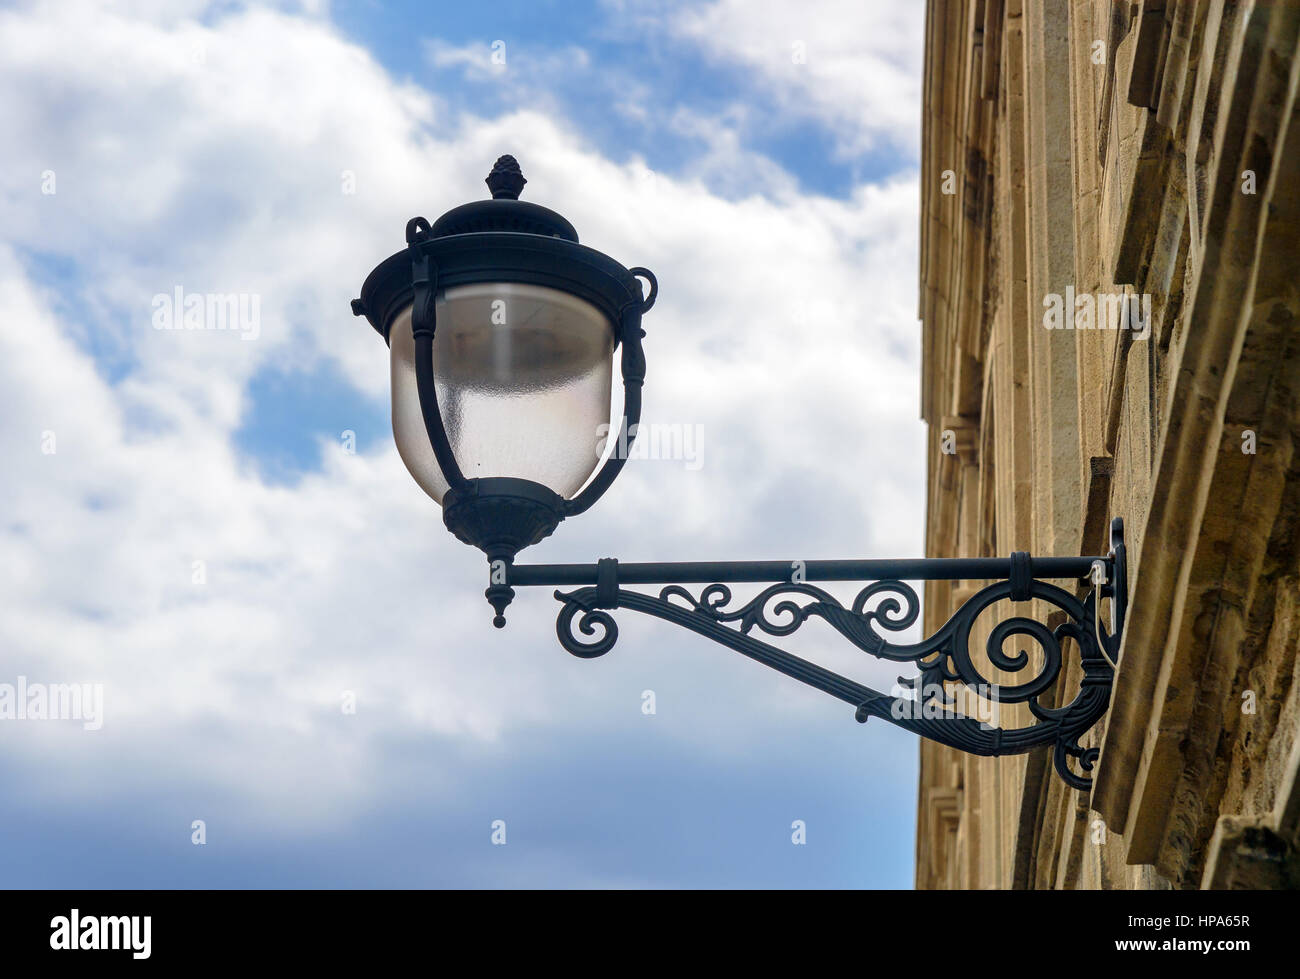 Old lamp on street in Old city, Icheri Sheher. Baku, Azerbaijan. Stock Photo